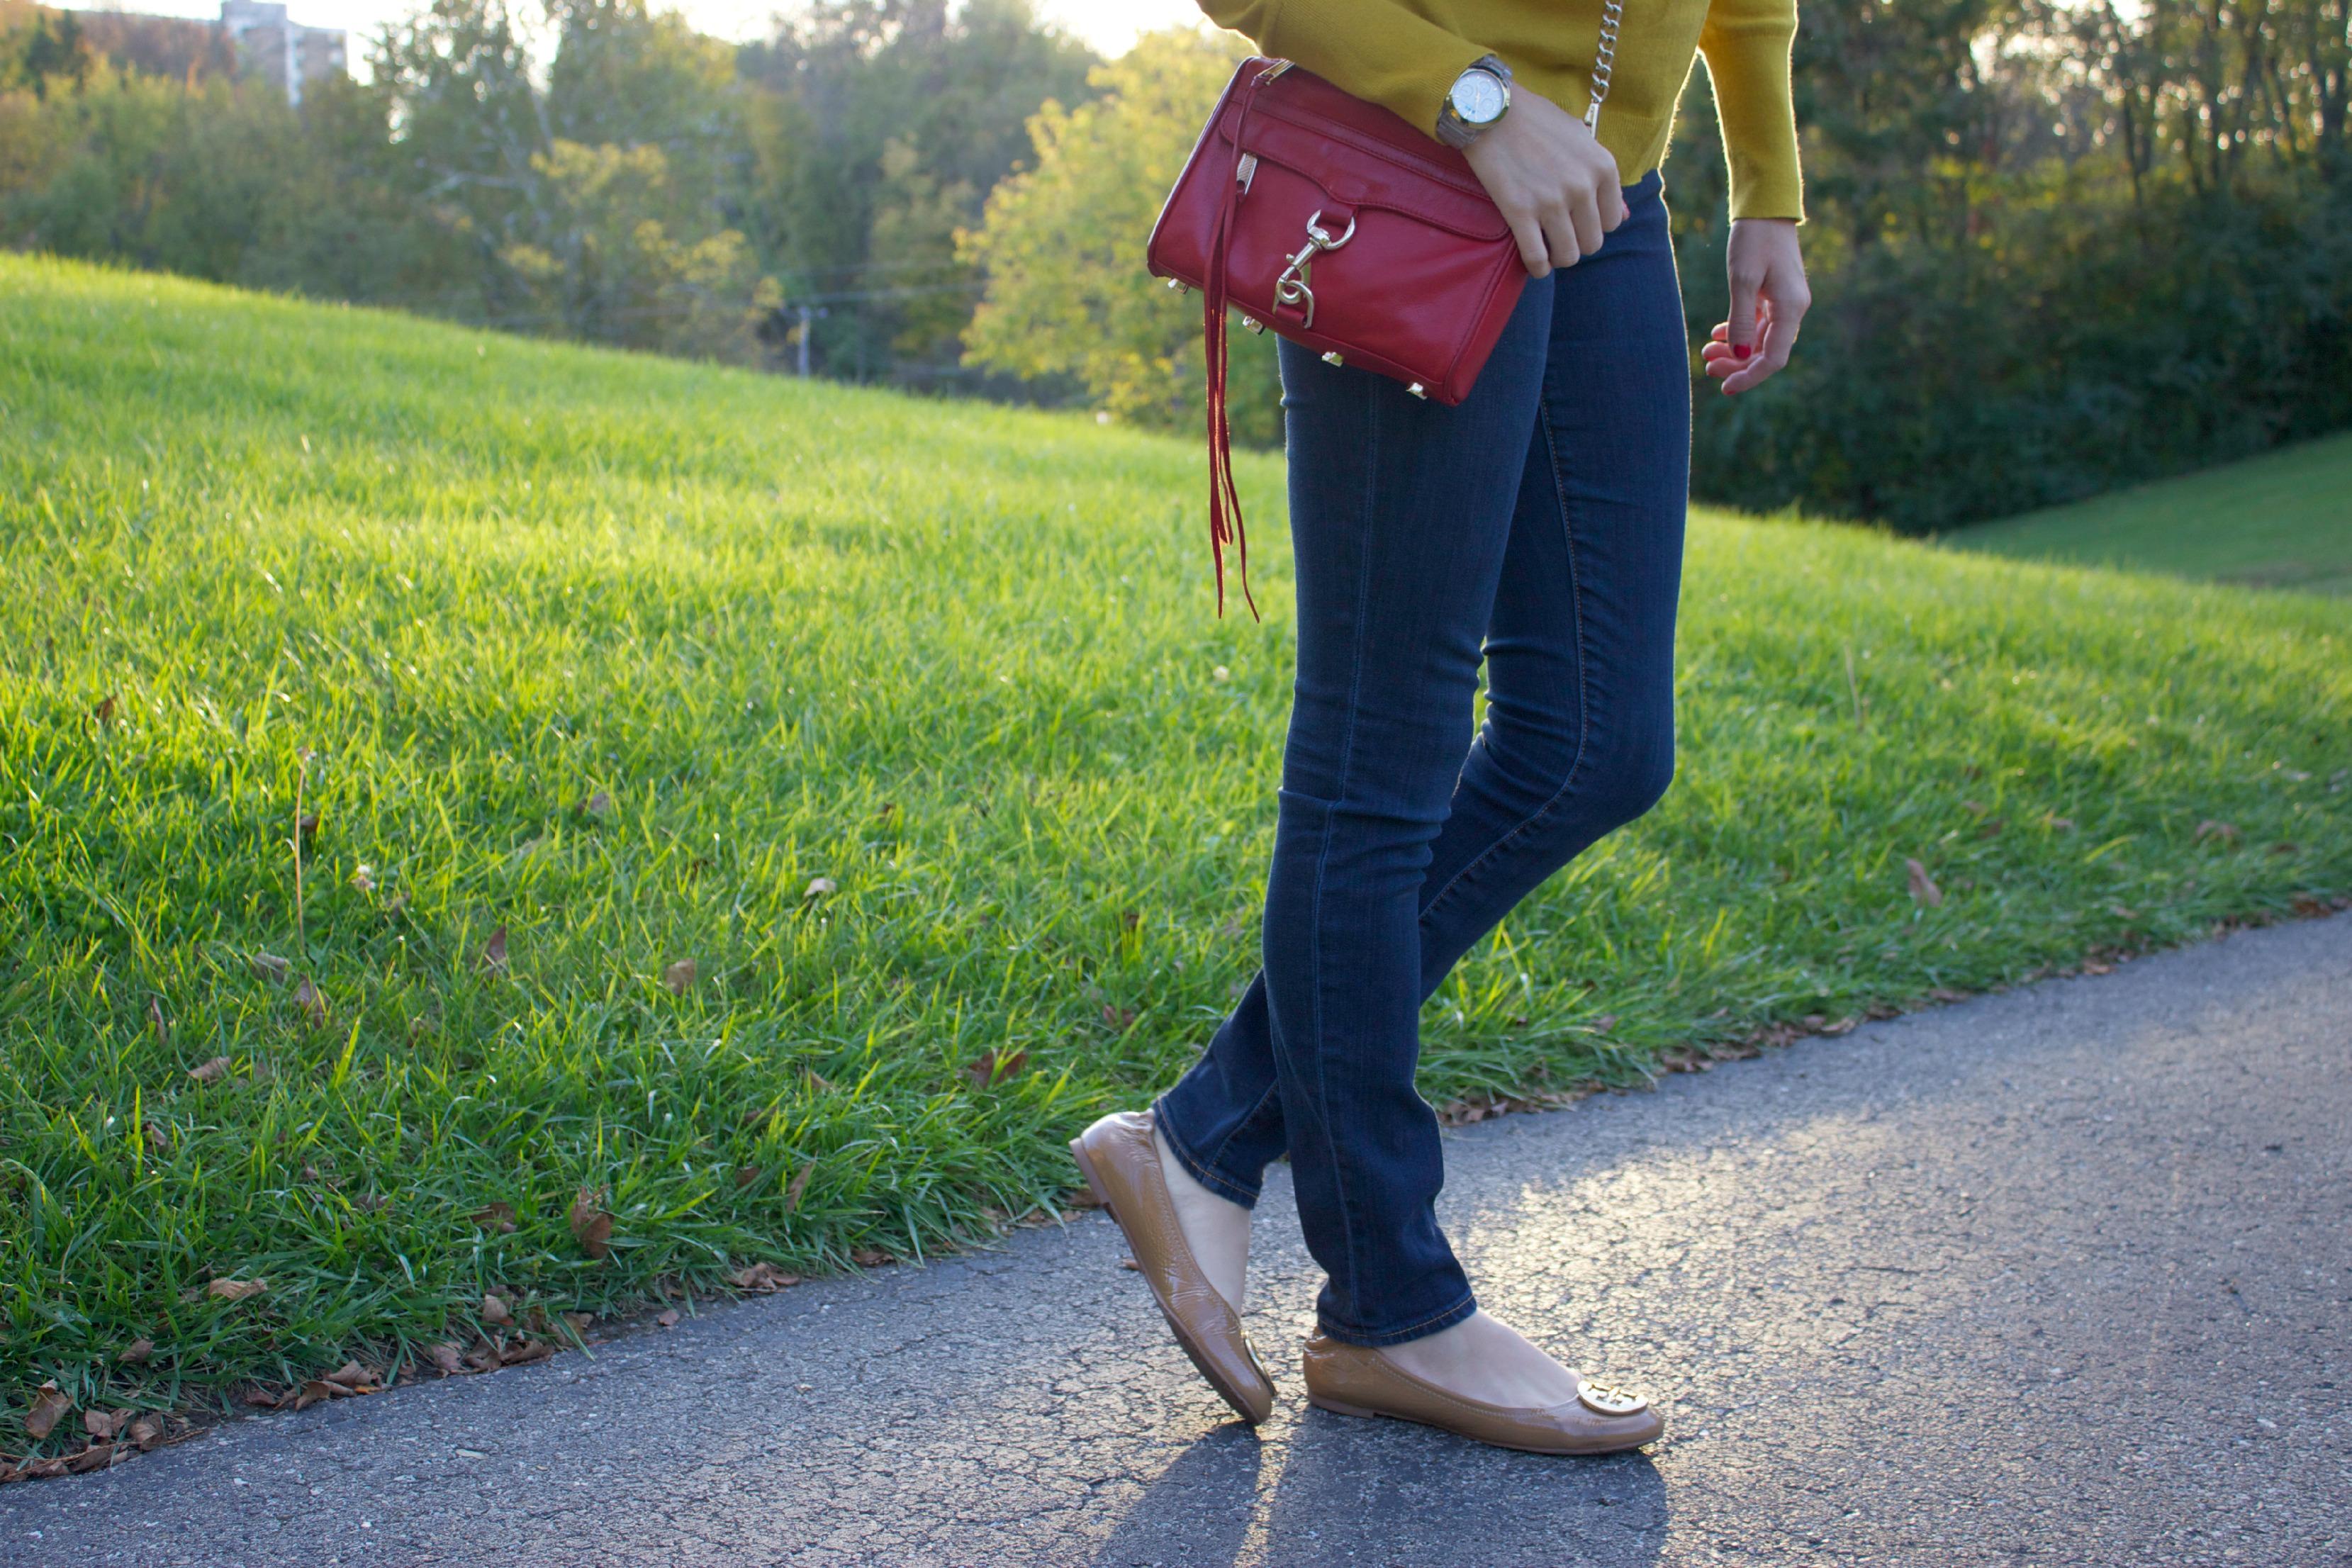 Gap Skinny Jeans, Tory Burch Reva Flats